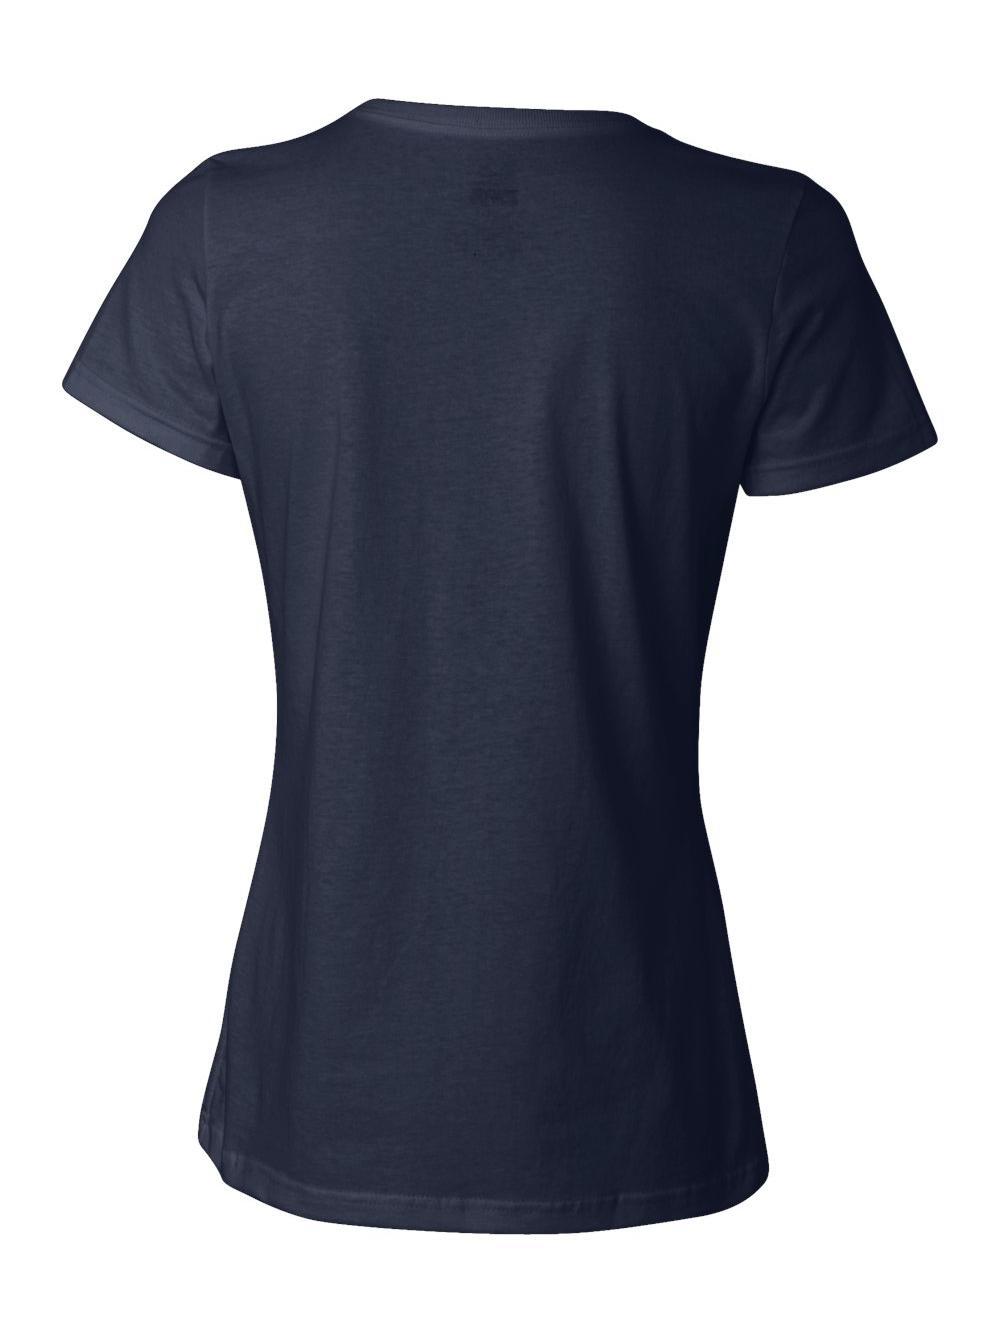 Fruit-of-the-Loom-HD-Cotton-Women-039-s-Short-Sleeve-T-Shirt-L3930R thumbnail 16